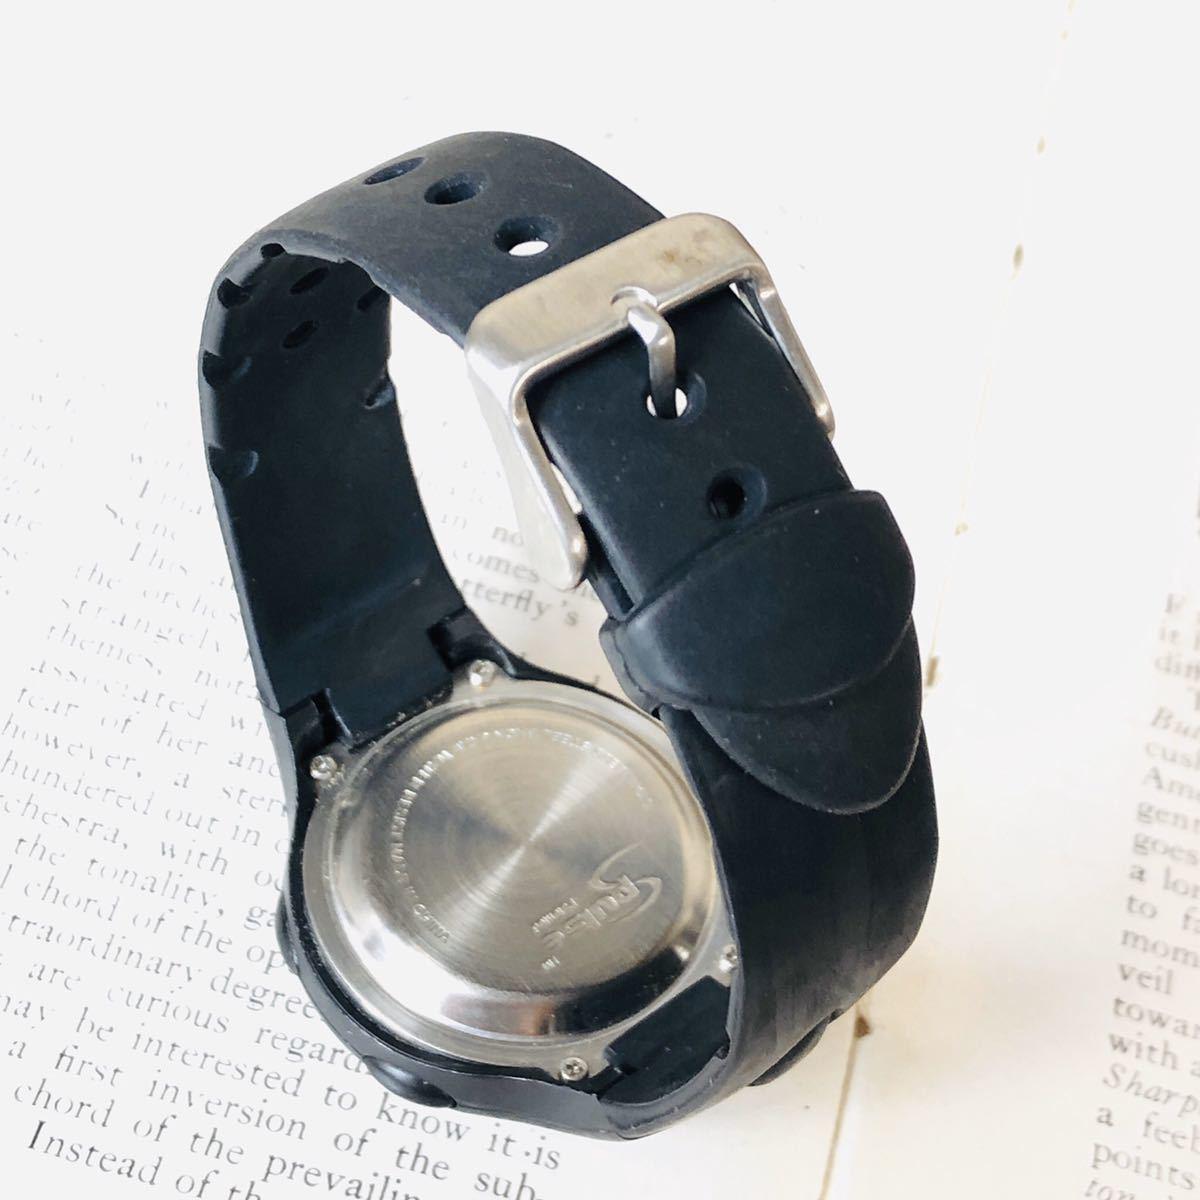 Reebok リーボック 腕時計 マットサテンシルバーカラー ブラック 心拍計 クロノ タイマー デジタル 稼動品 W730_画像6